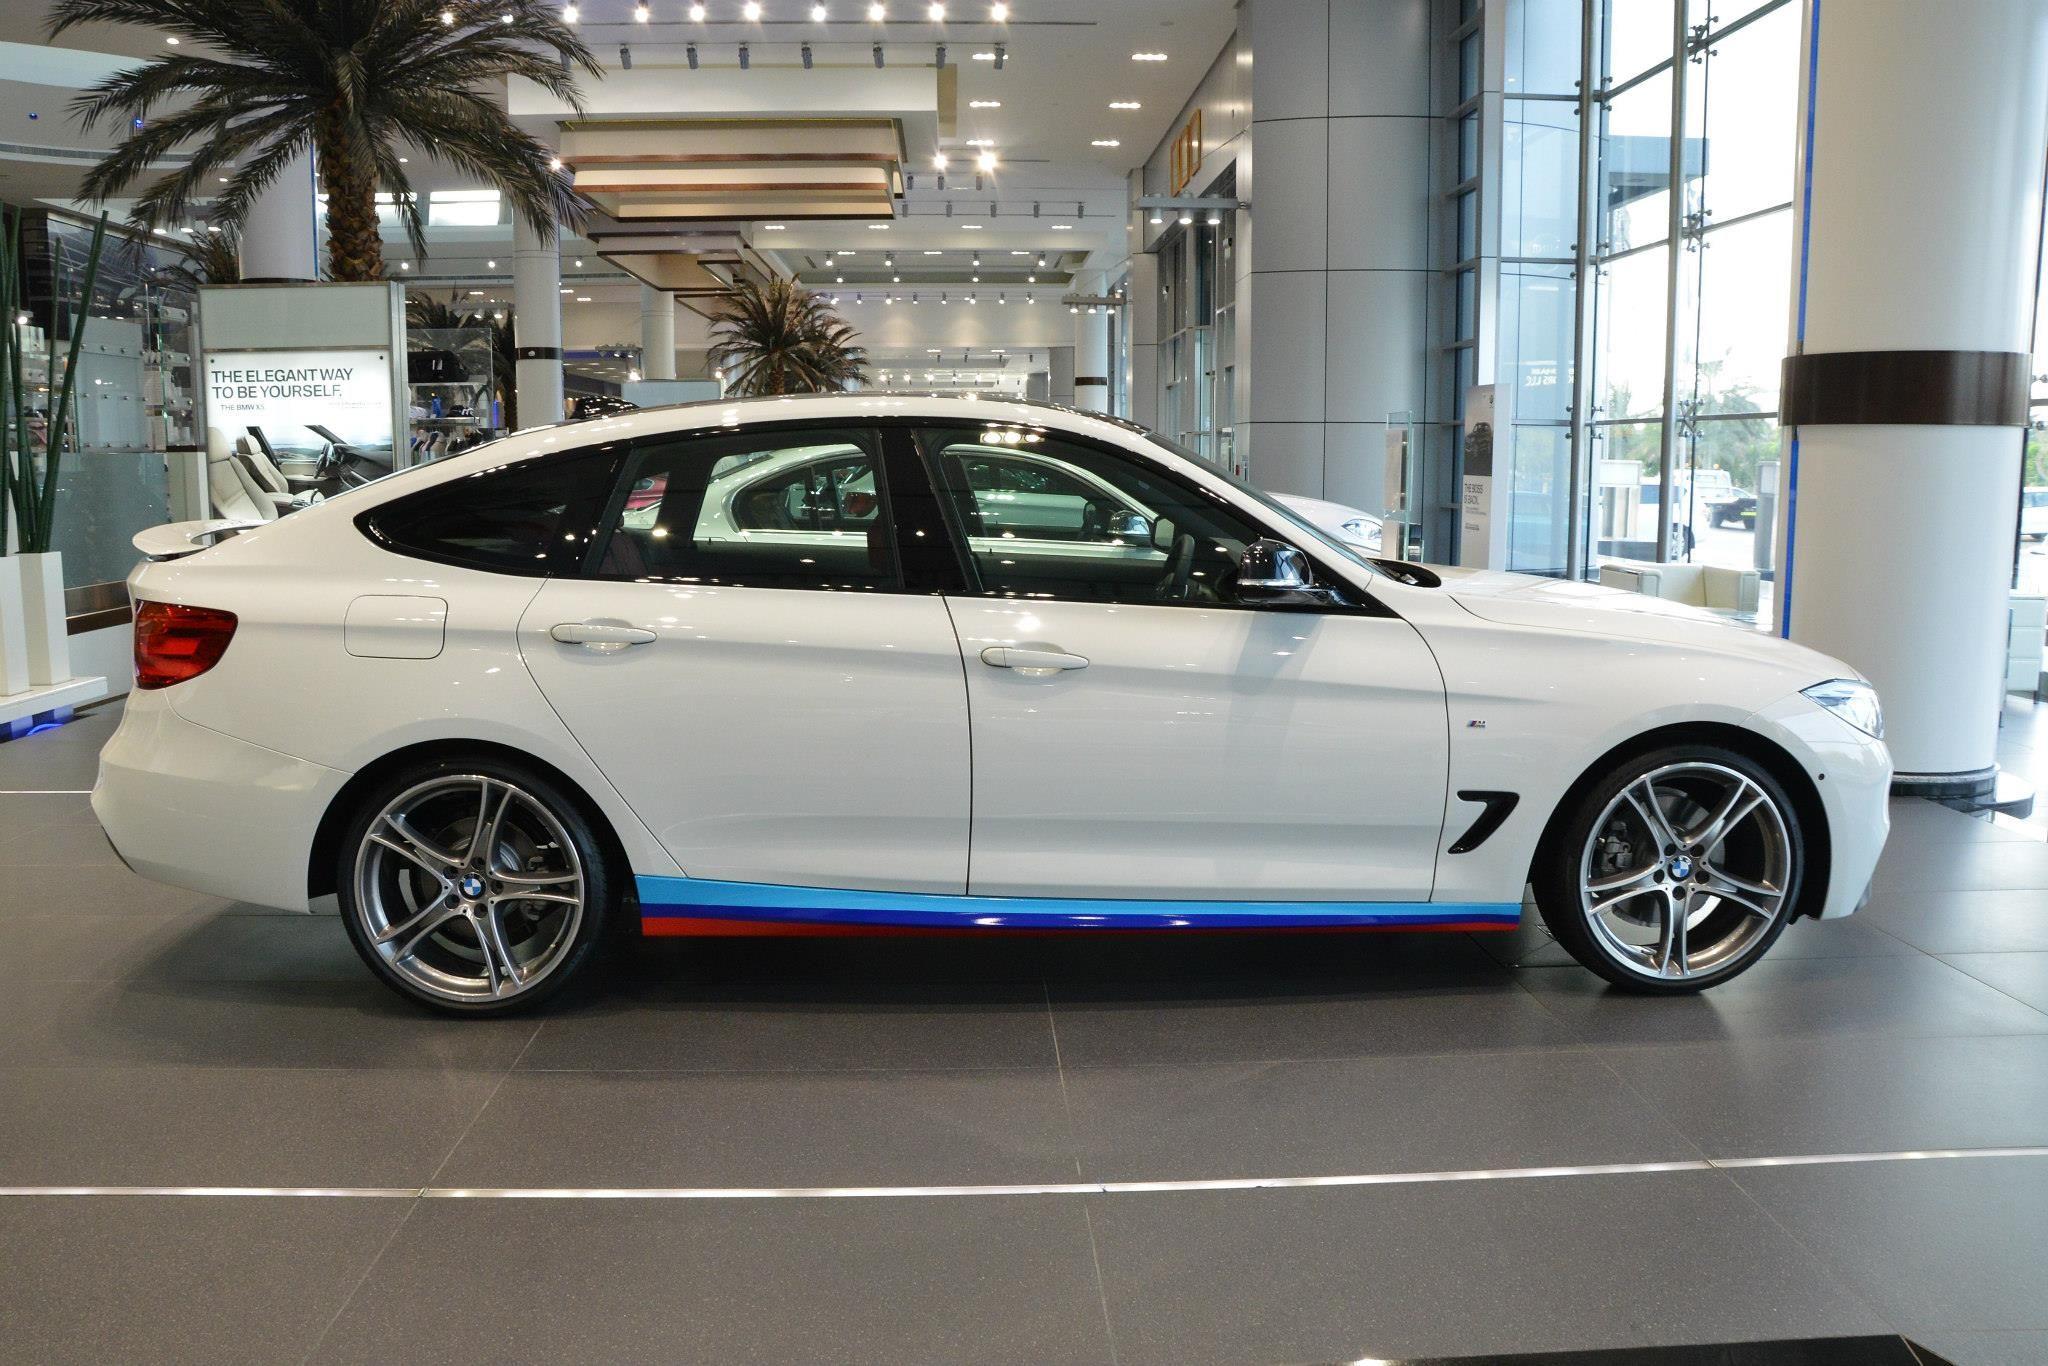 BMW 328I Gt >> Bmw 3 Series Gt With M Performance Parts Bmw Performance